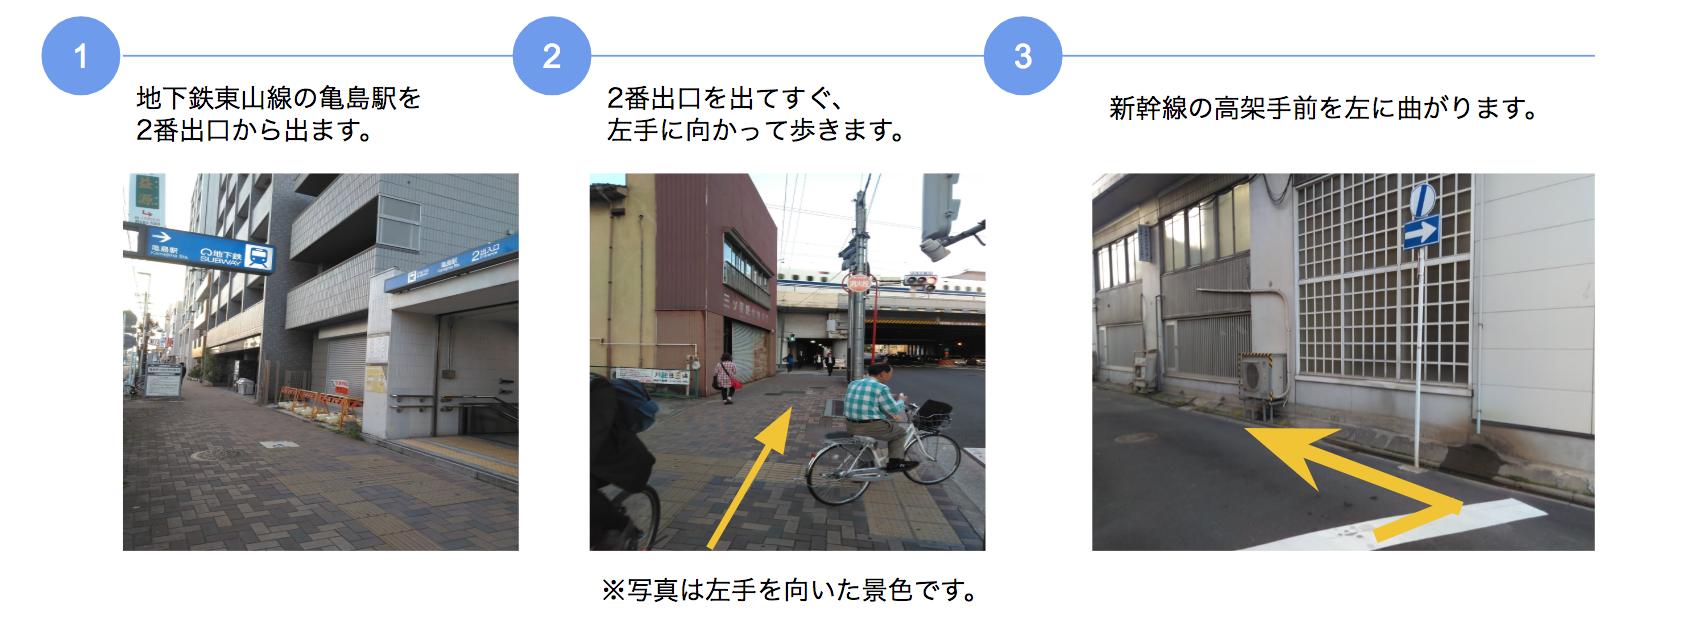 f:id:toyoshi:20180619161206p:plain